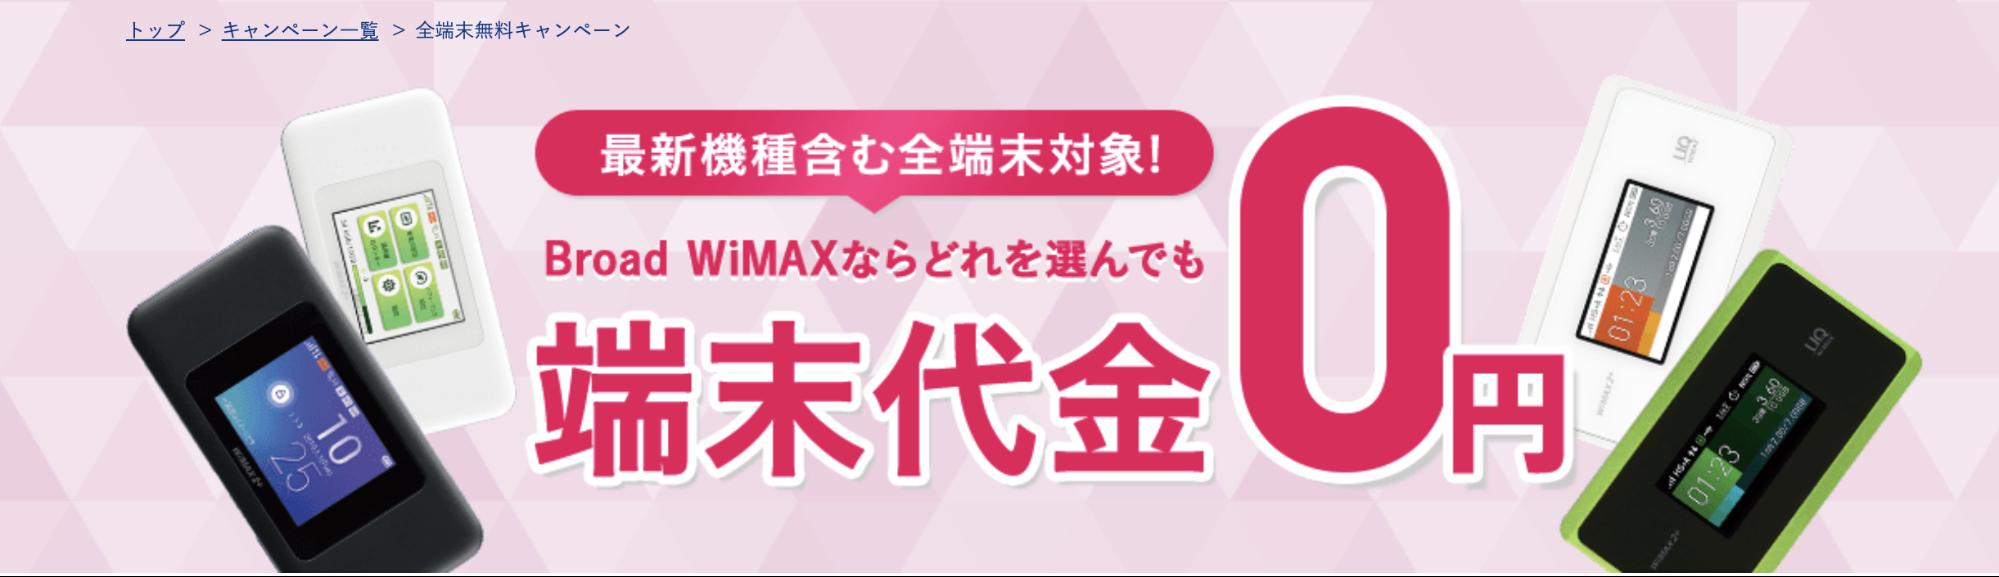 BroadWiMAX(ブロードワイマックス)の端末無料キャンペーン